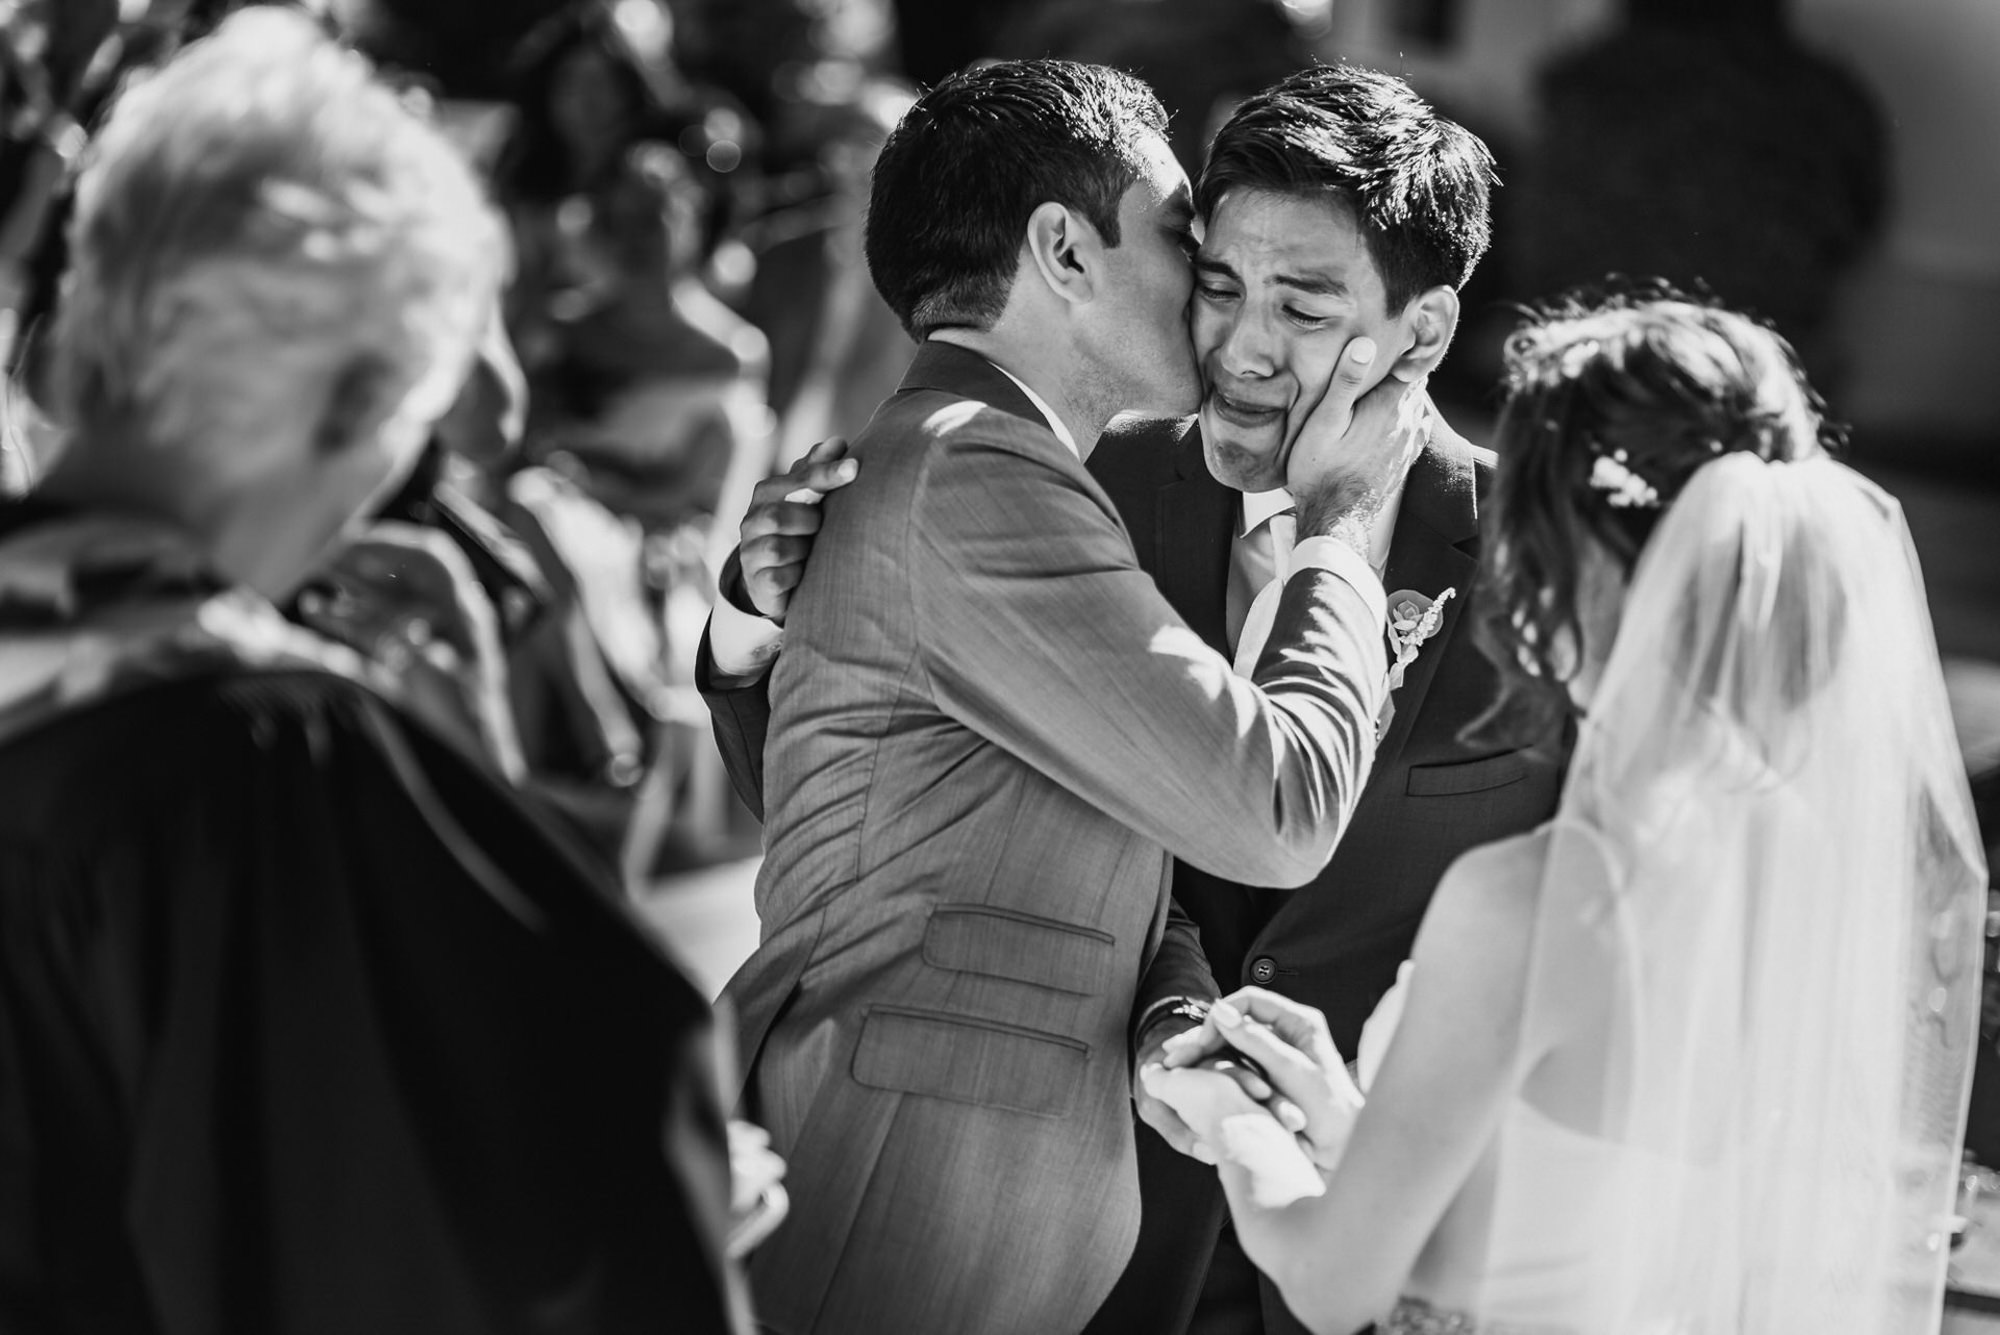 Emotional portrait of dad kissing groom - photo by Ken Pak